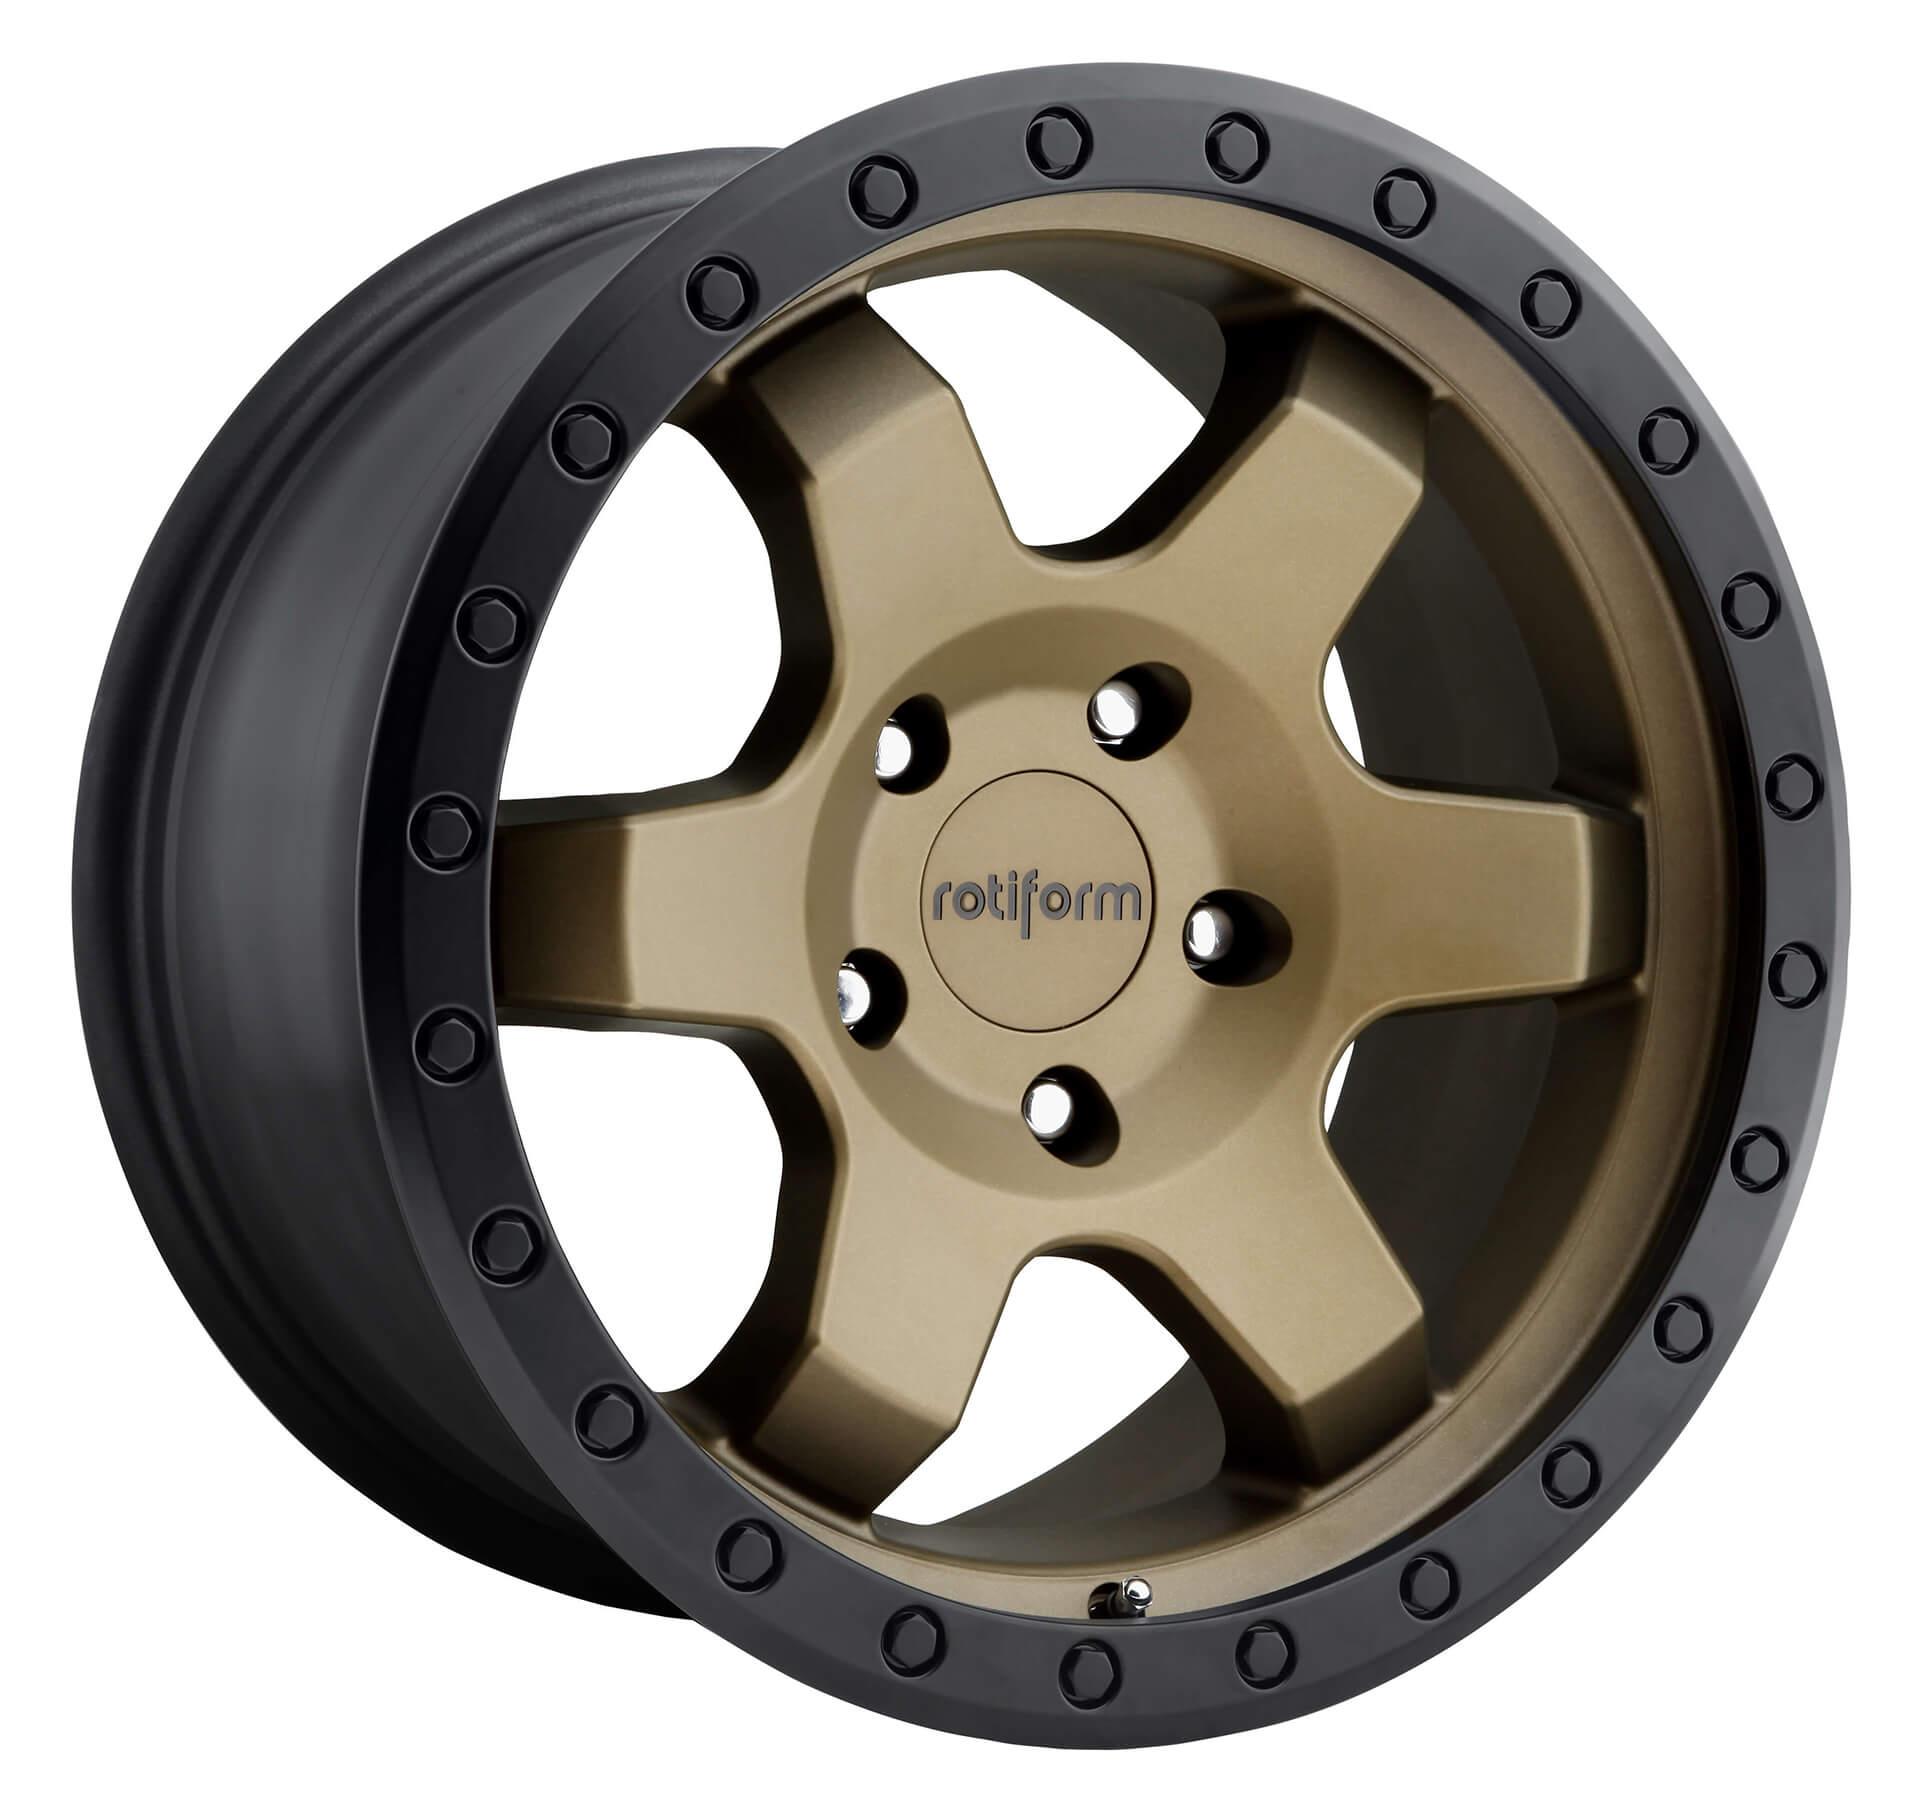 Rotiform Monoblock Wheel - SIX-OR Cast 1 Piece